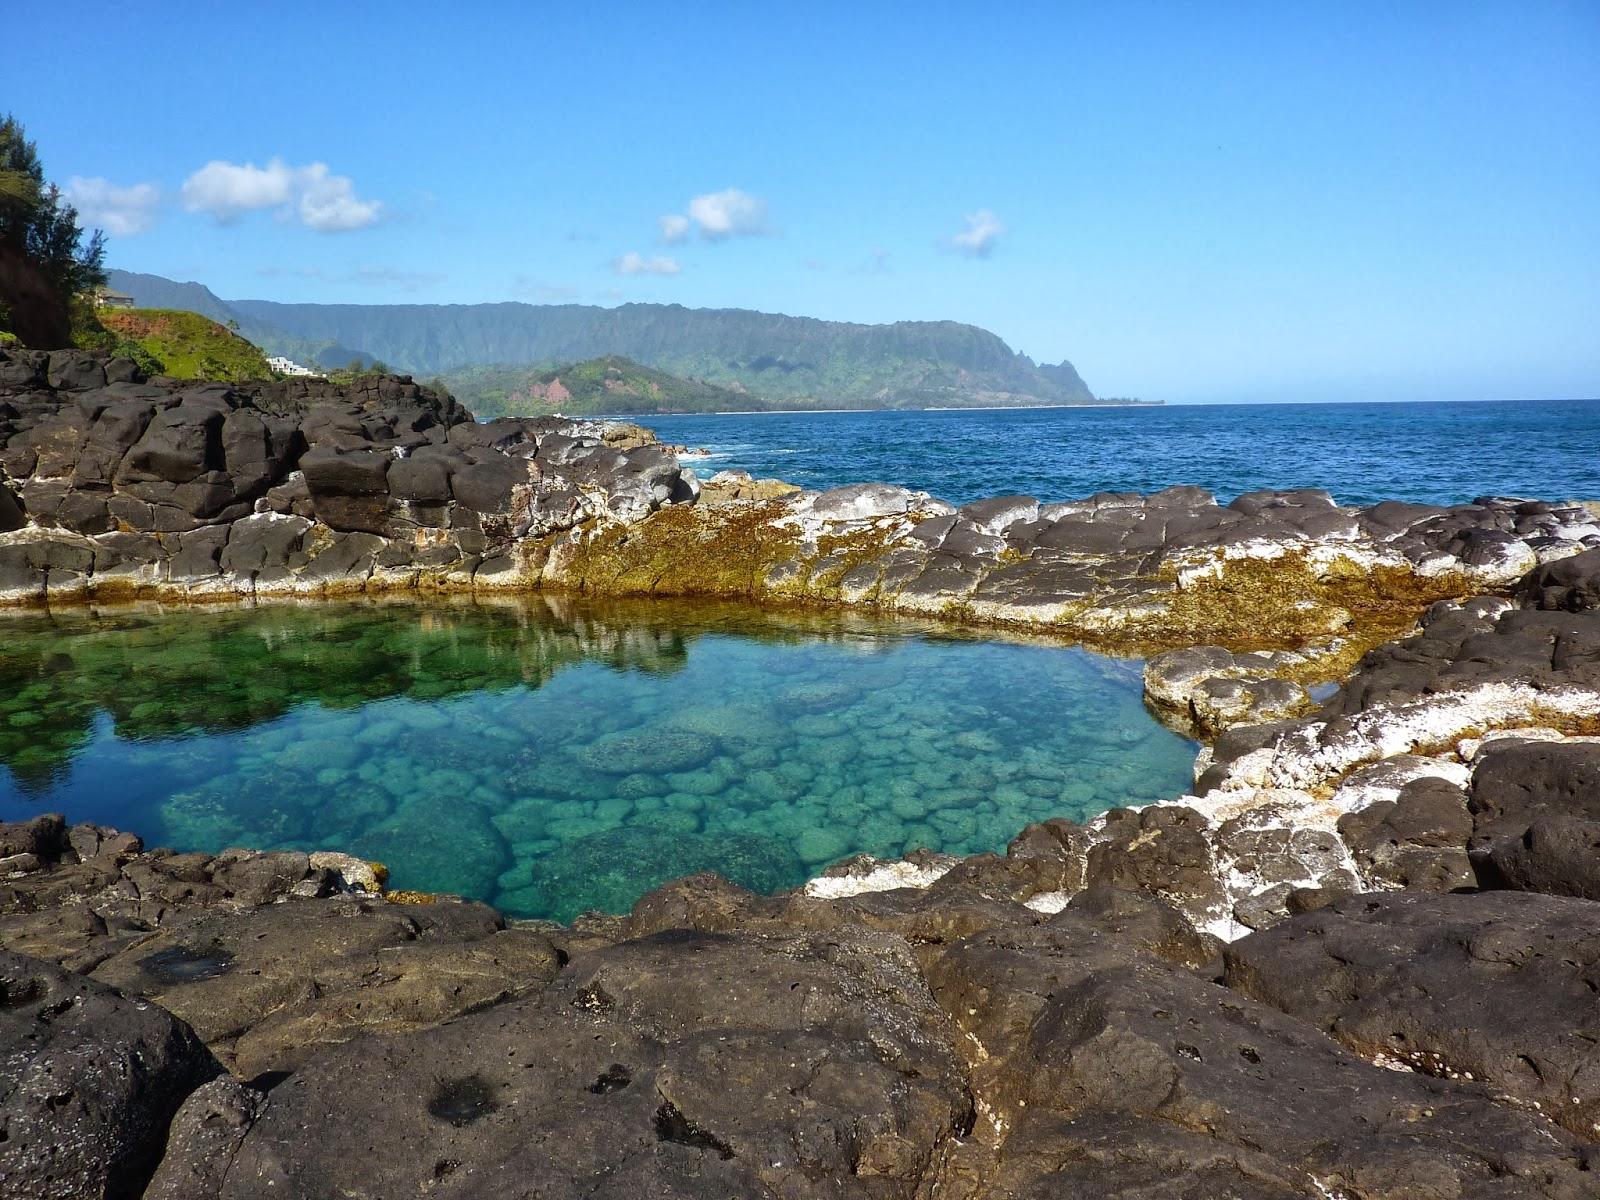 Me and My Green Bin: Highlights of a Trip to Kaua'i